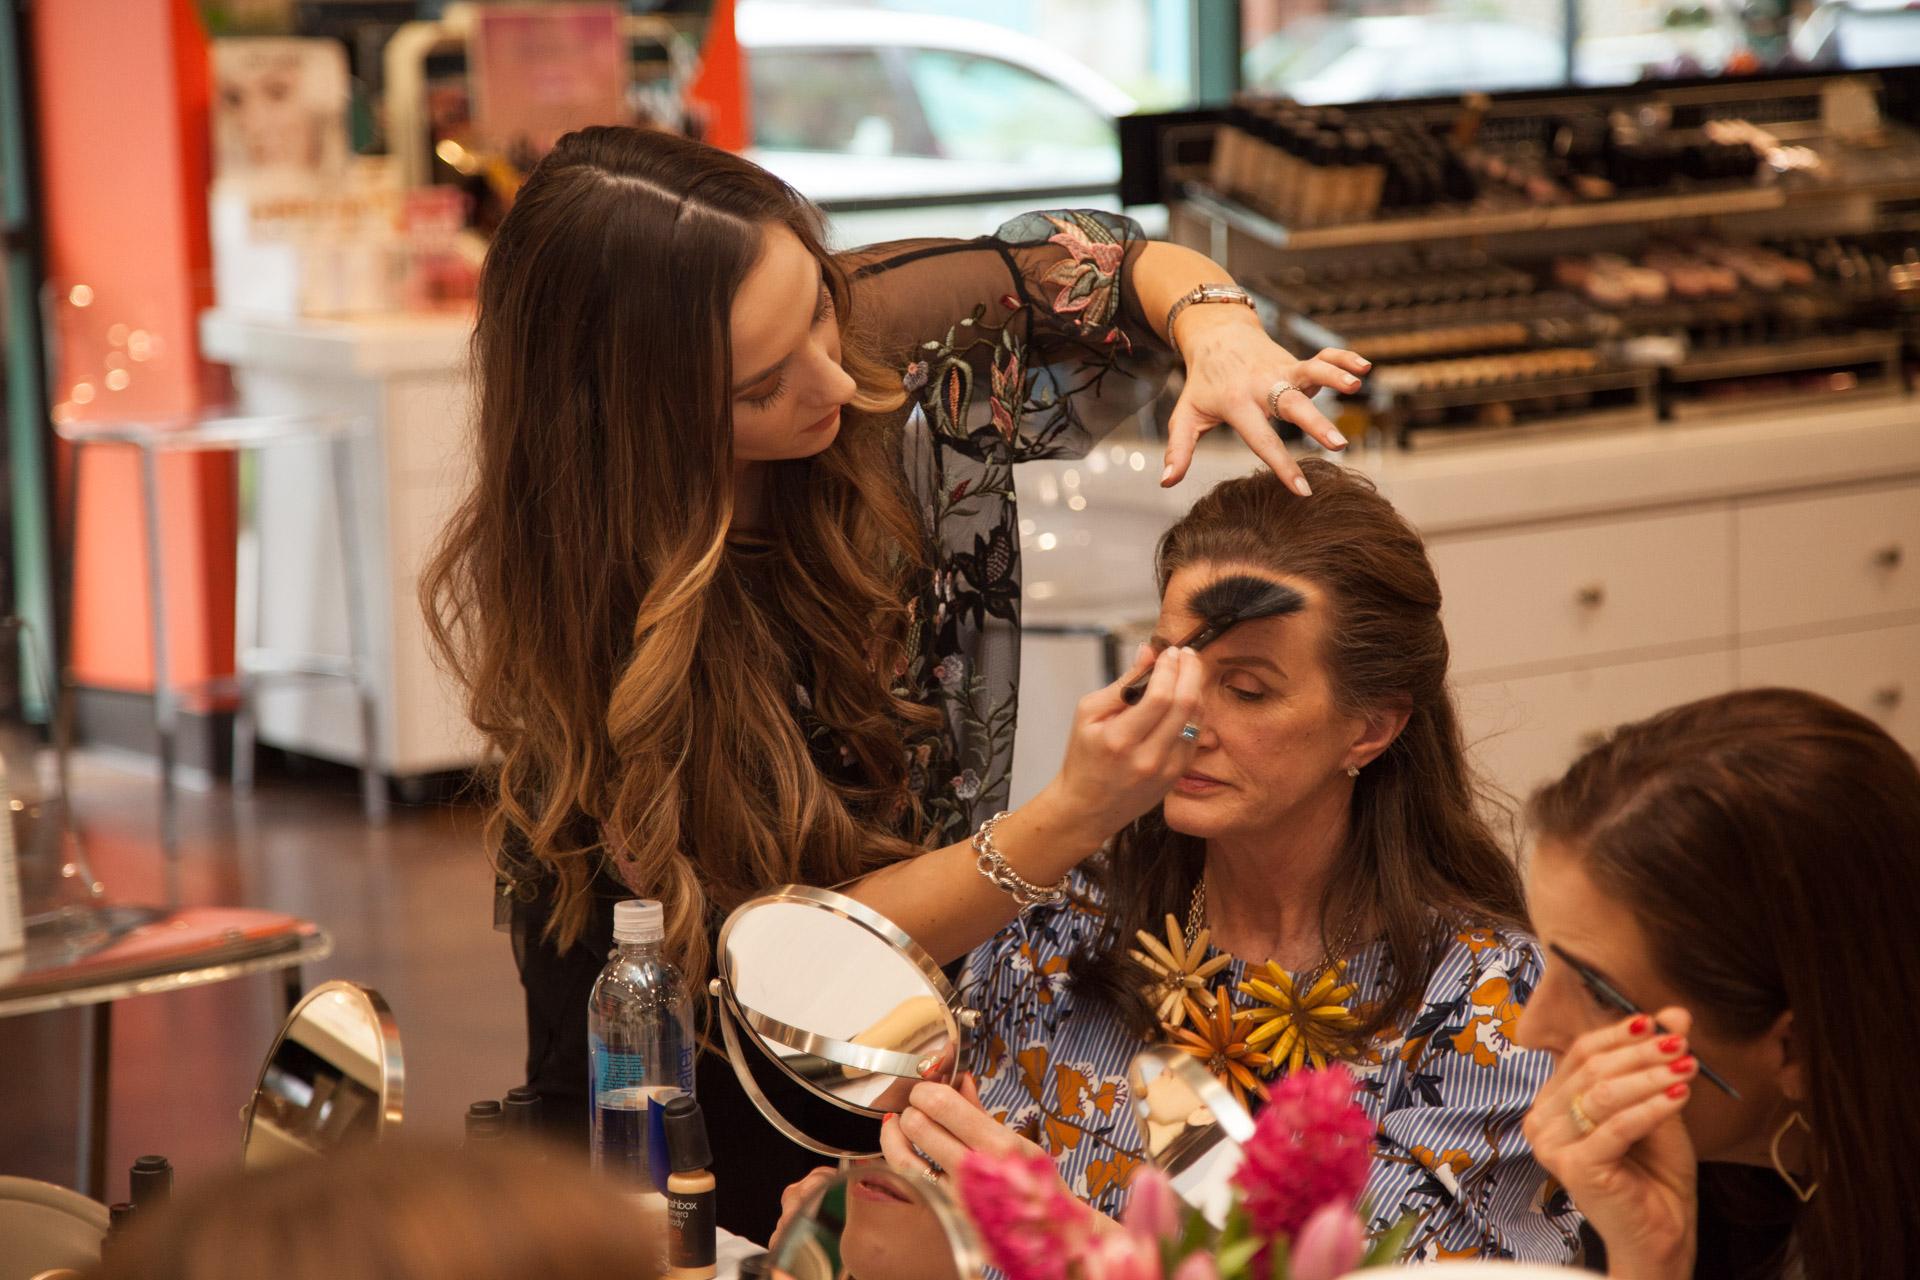 NFW_TheCosmeticMarket_BeautyWorkshop_DesireeCiara-18.jpg